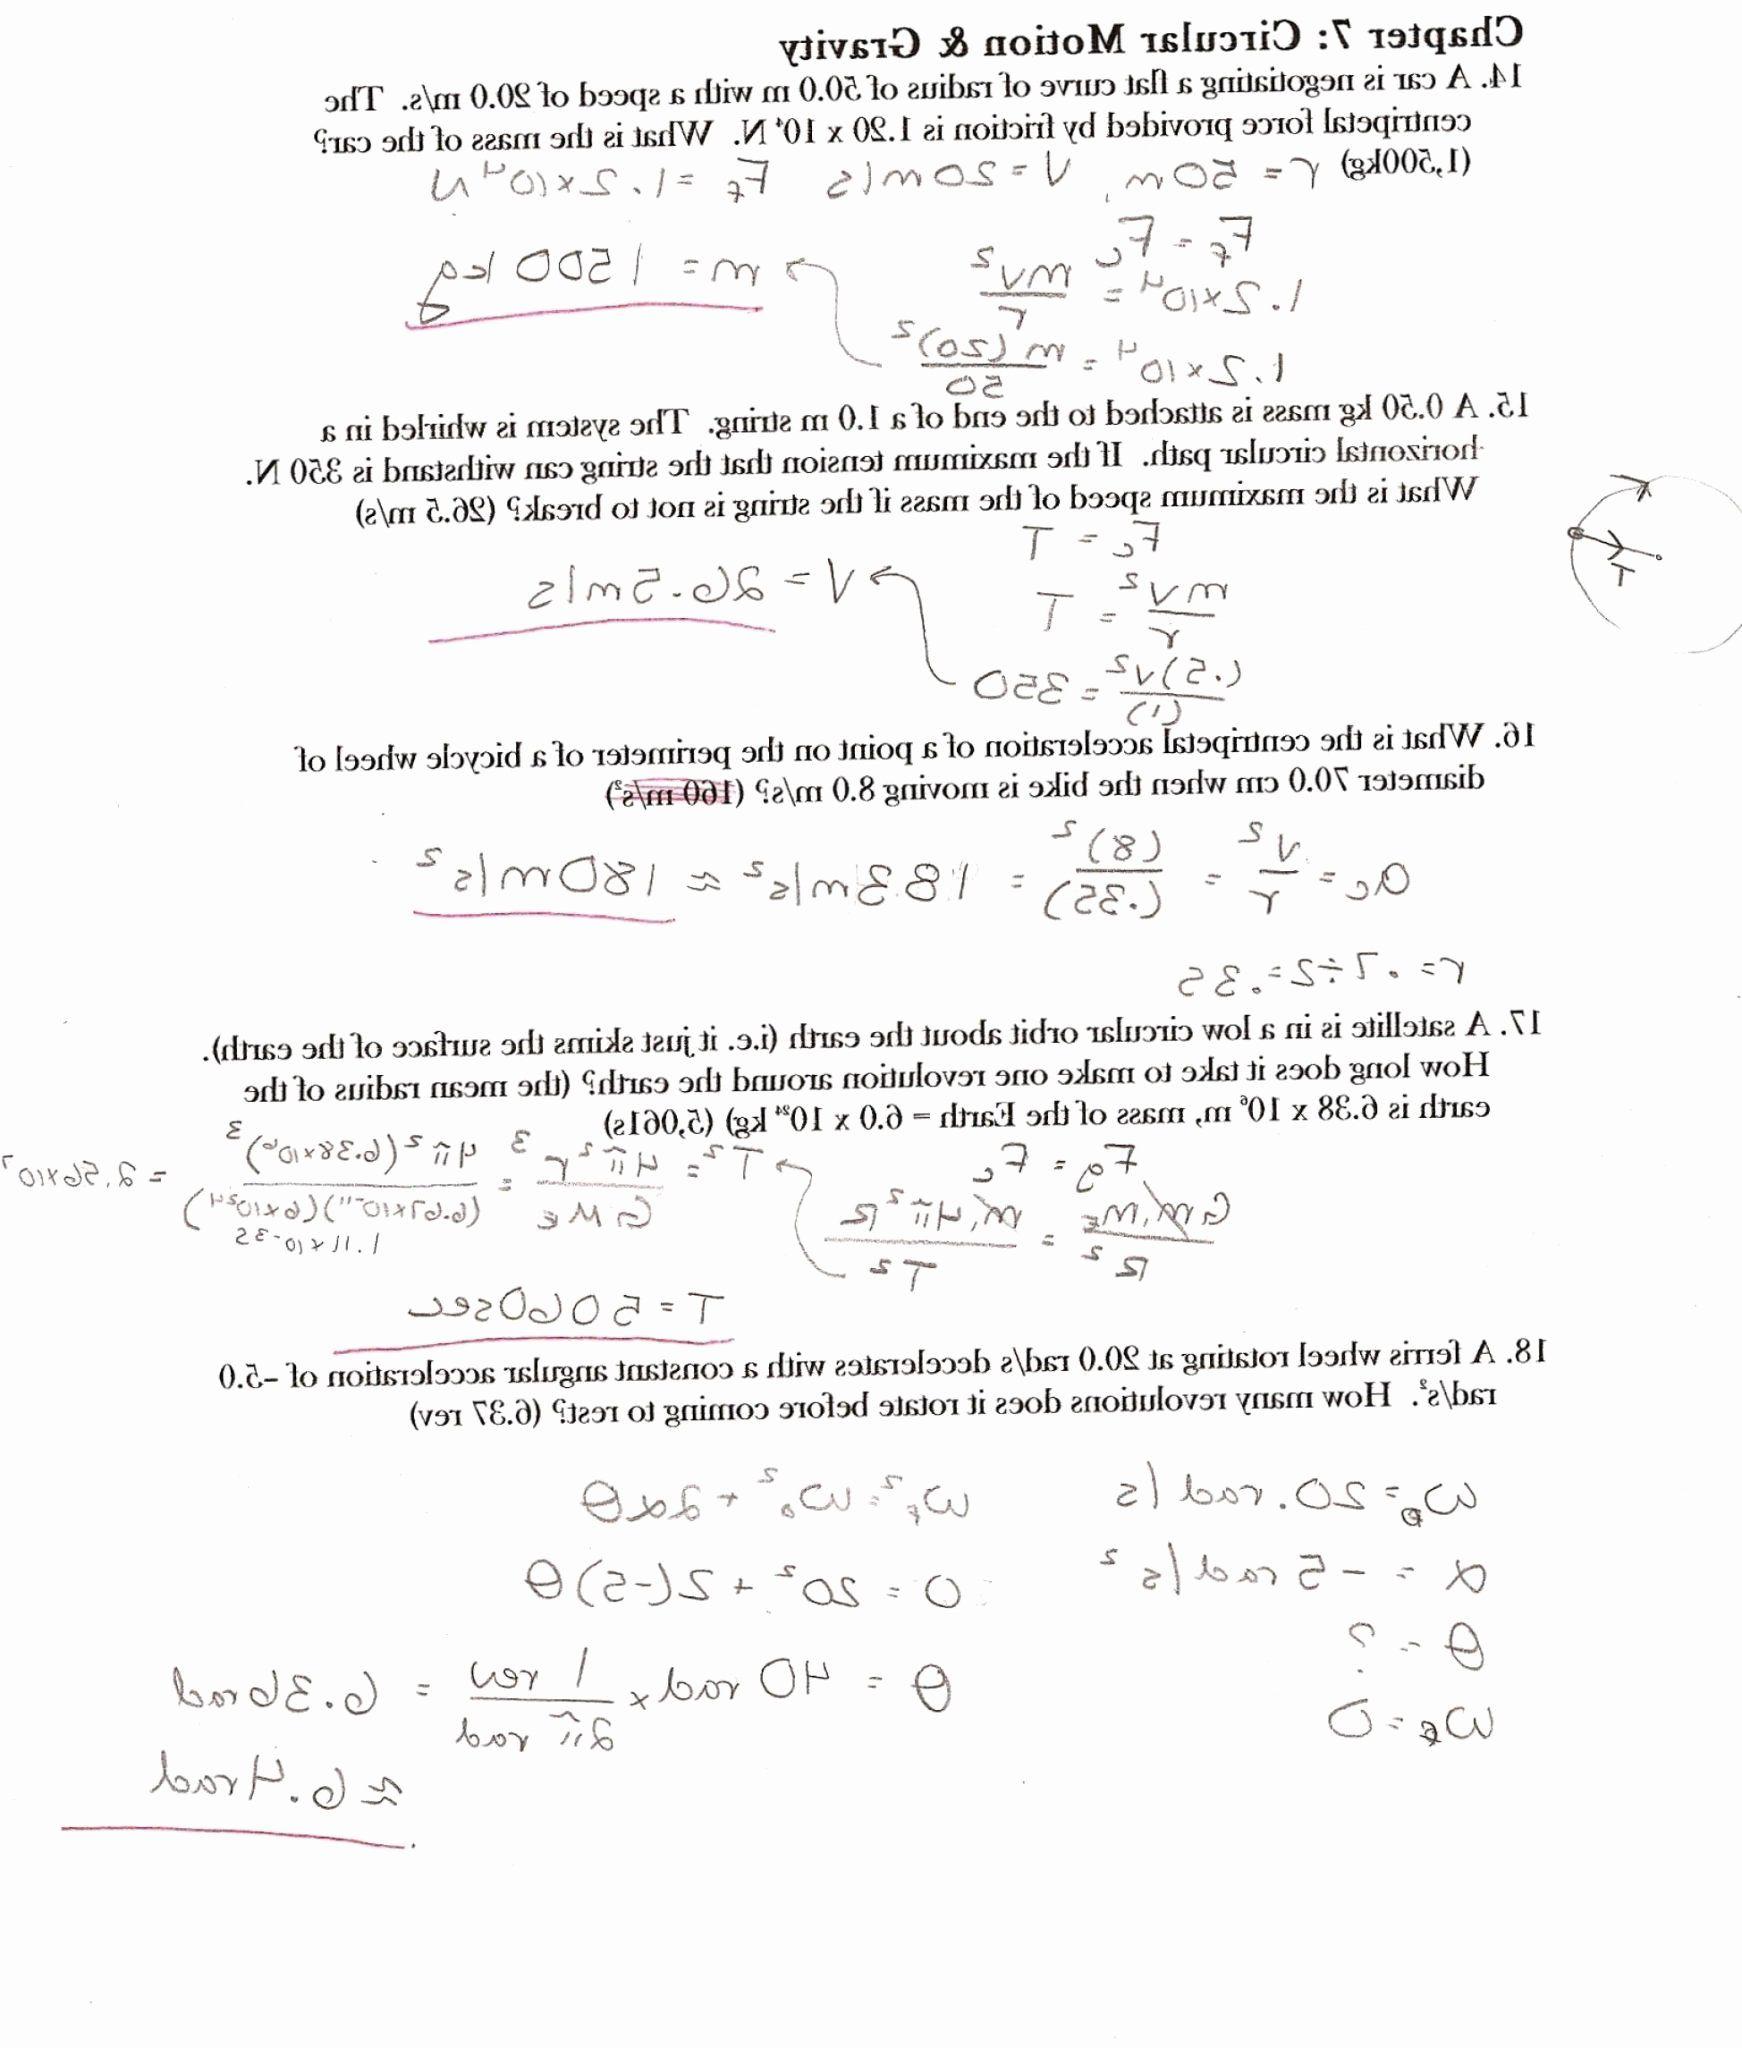 Vector Worksheet Physics Answers Awesome Carbon Cycle Worksheet Answer Key In 2020 Physics Answers Graphing Quadratics Persuasive Writing Prompts